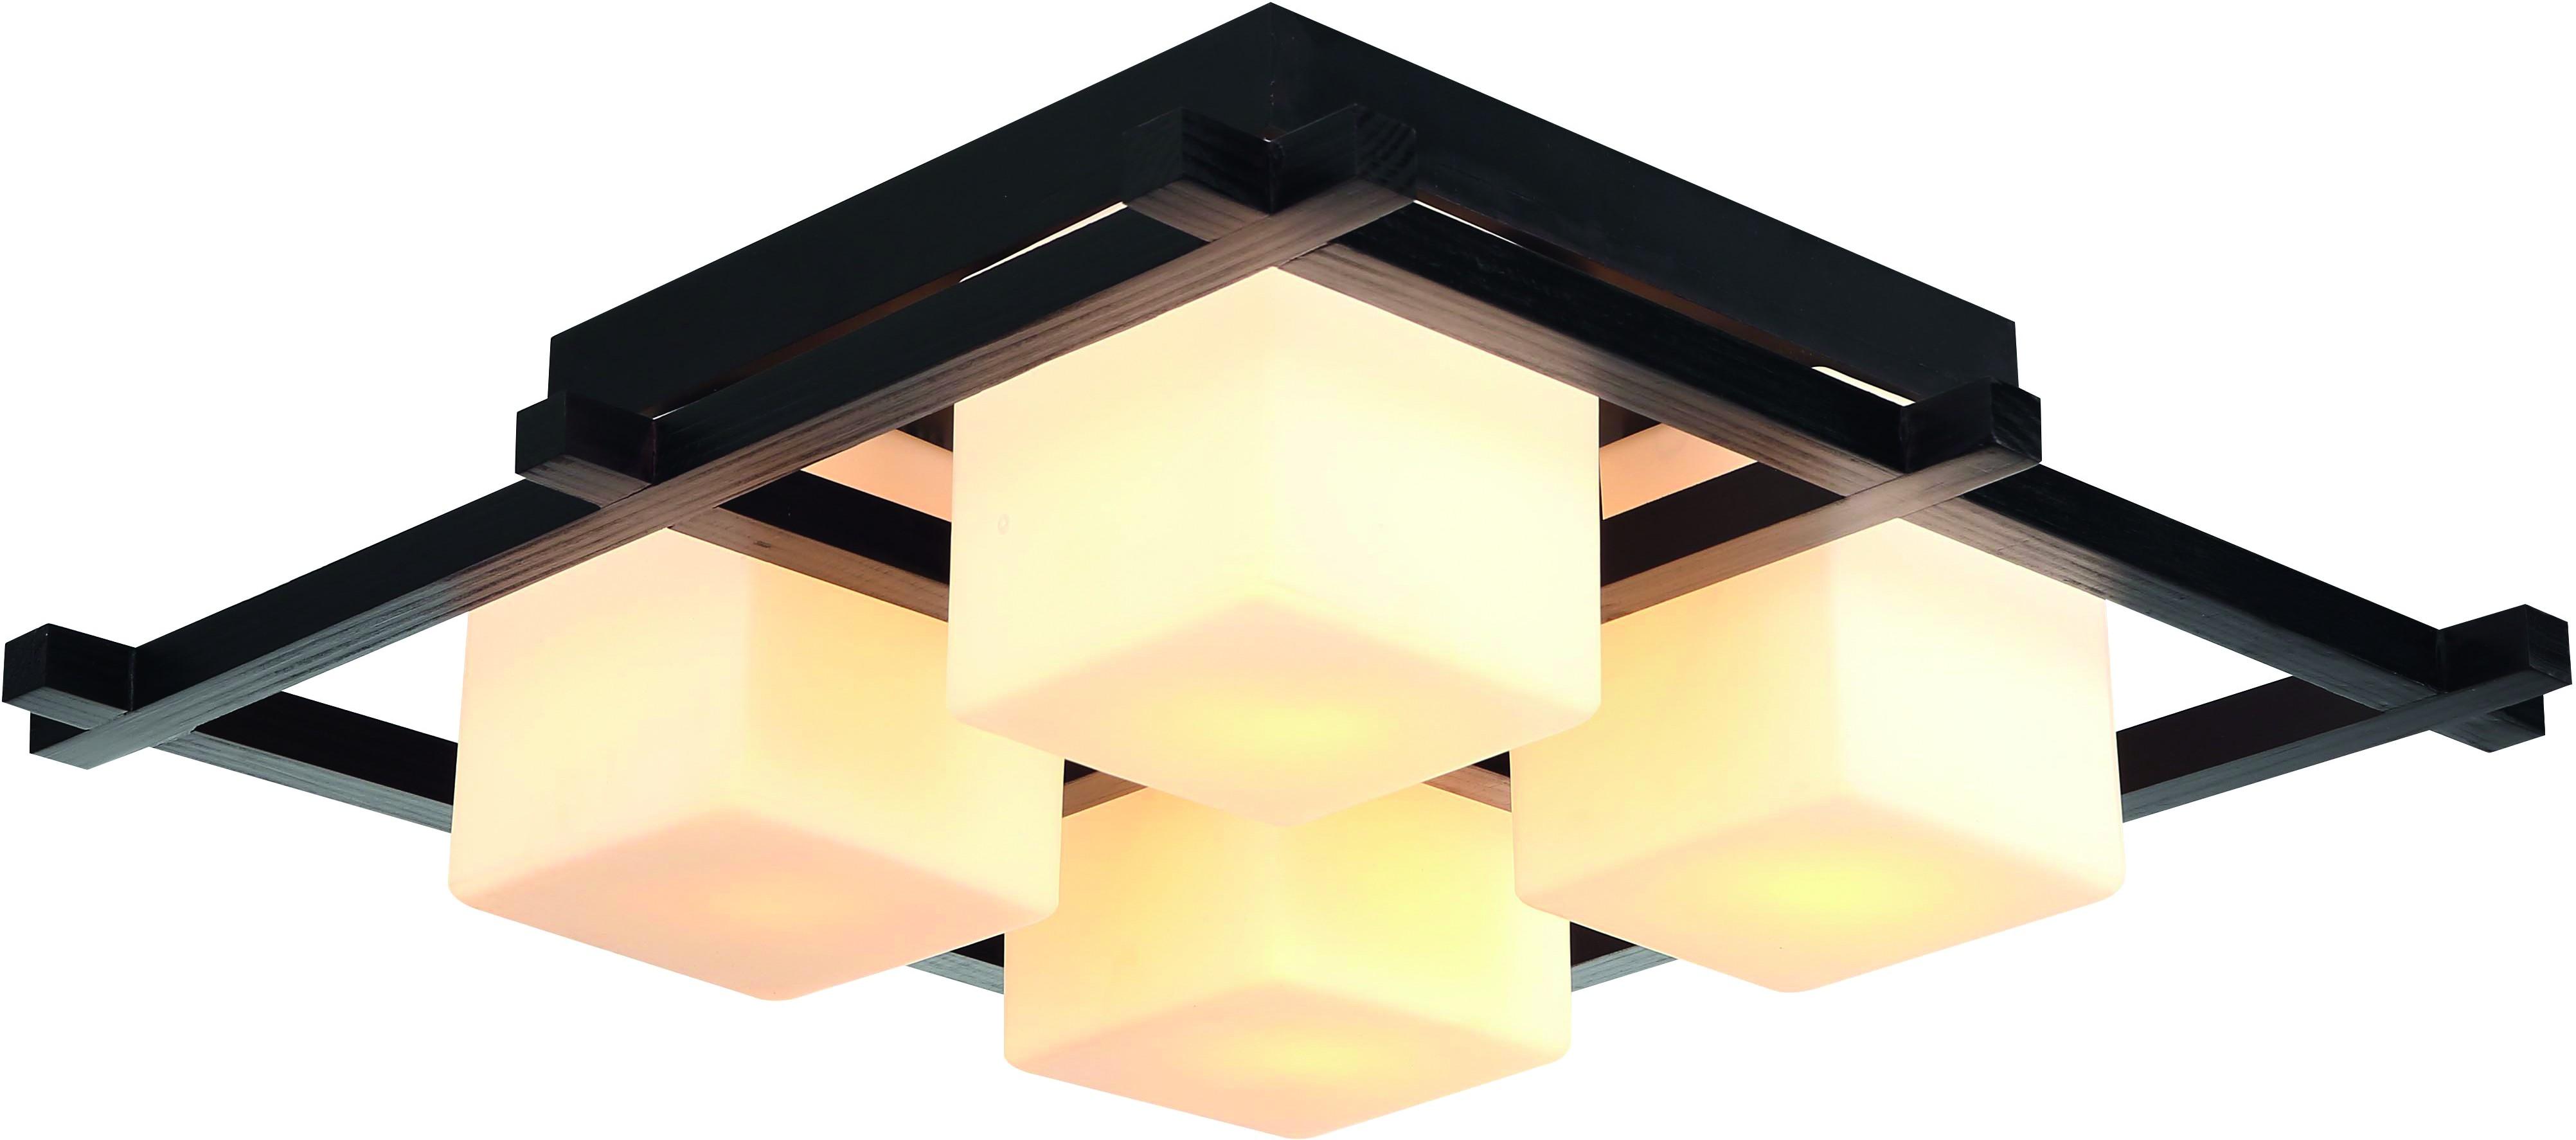 Люстра Arte lamp A8252pl-4ck